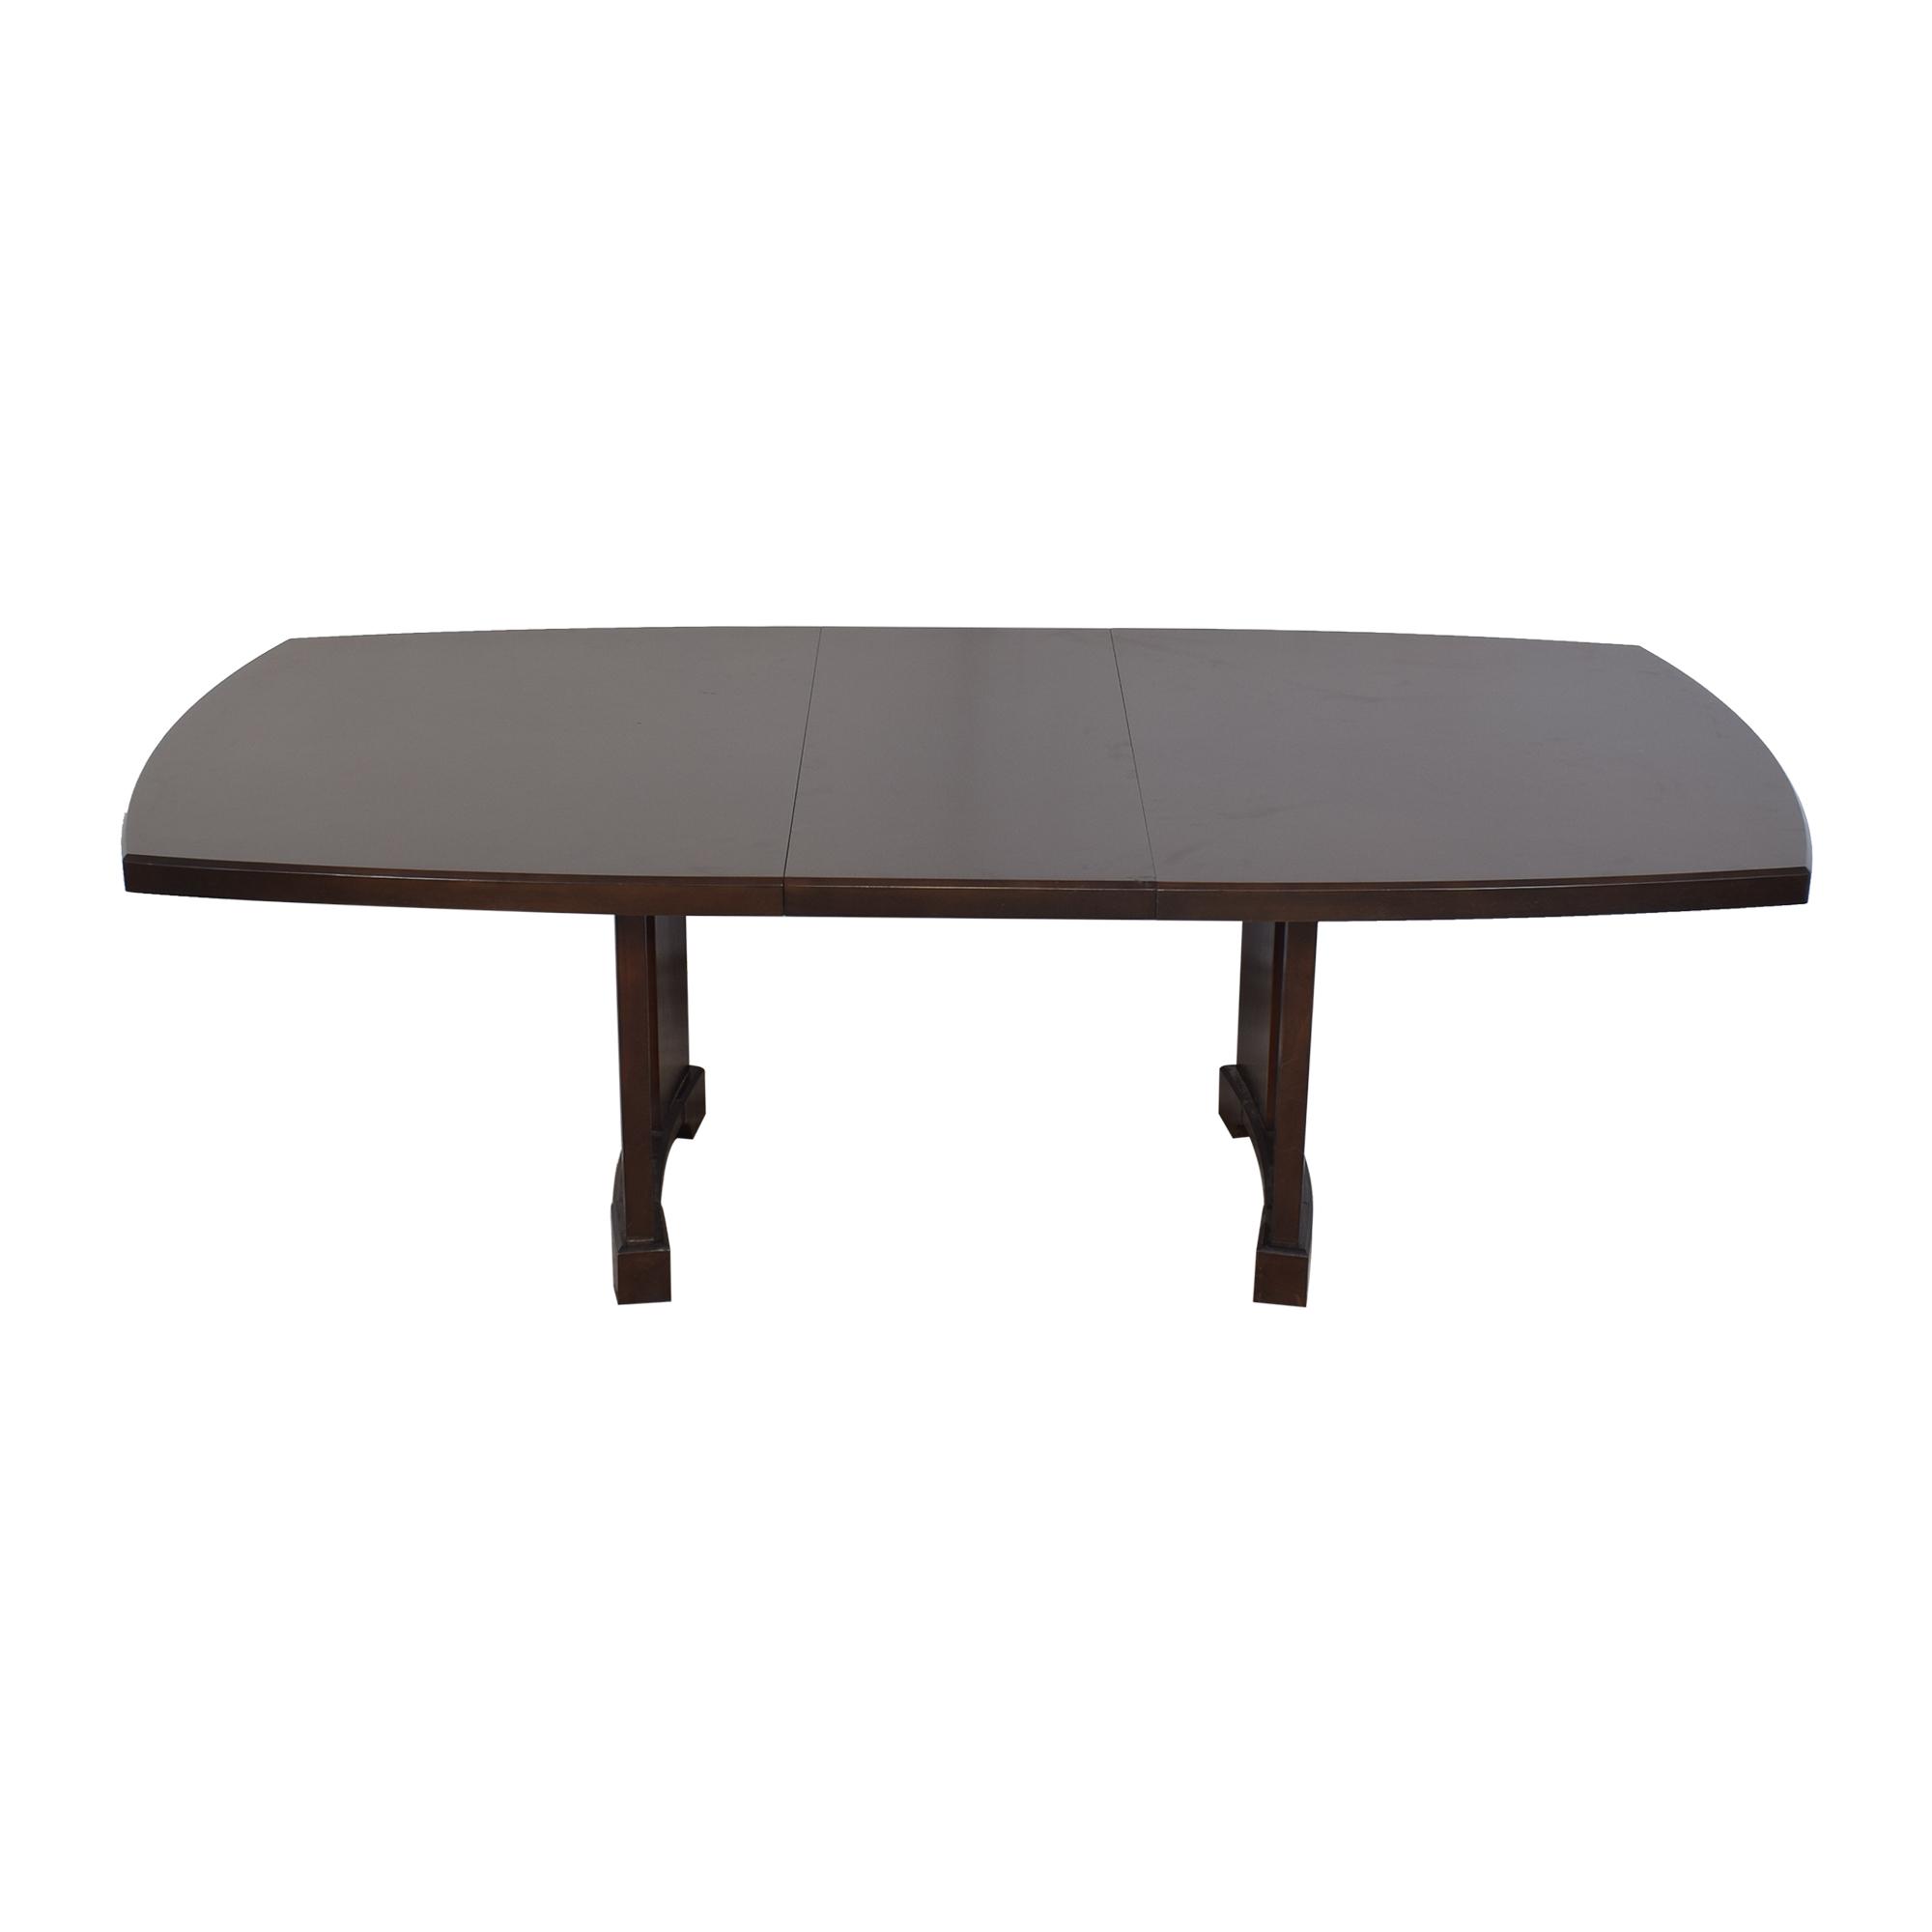 Casana Furniture Casana Extendable Dining Table on sale